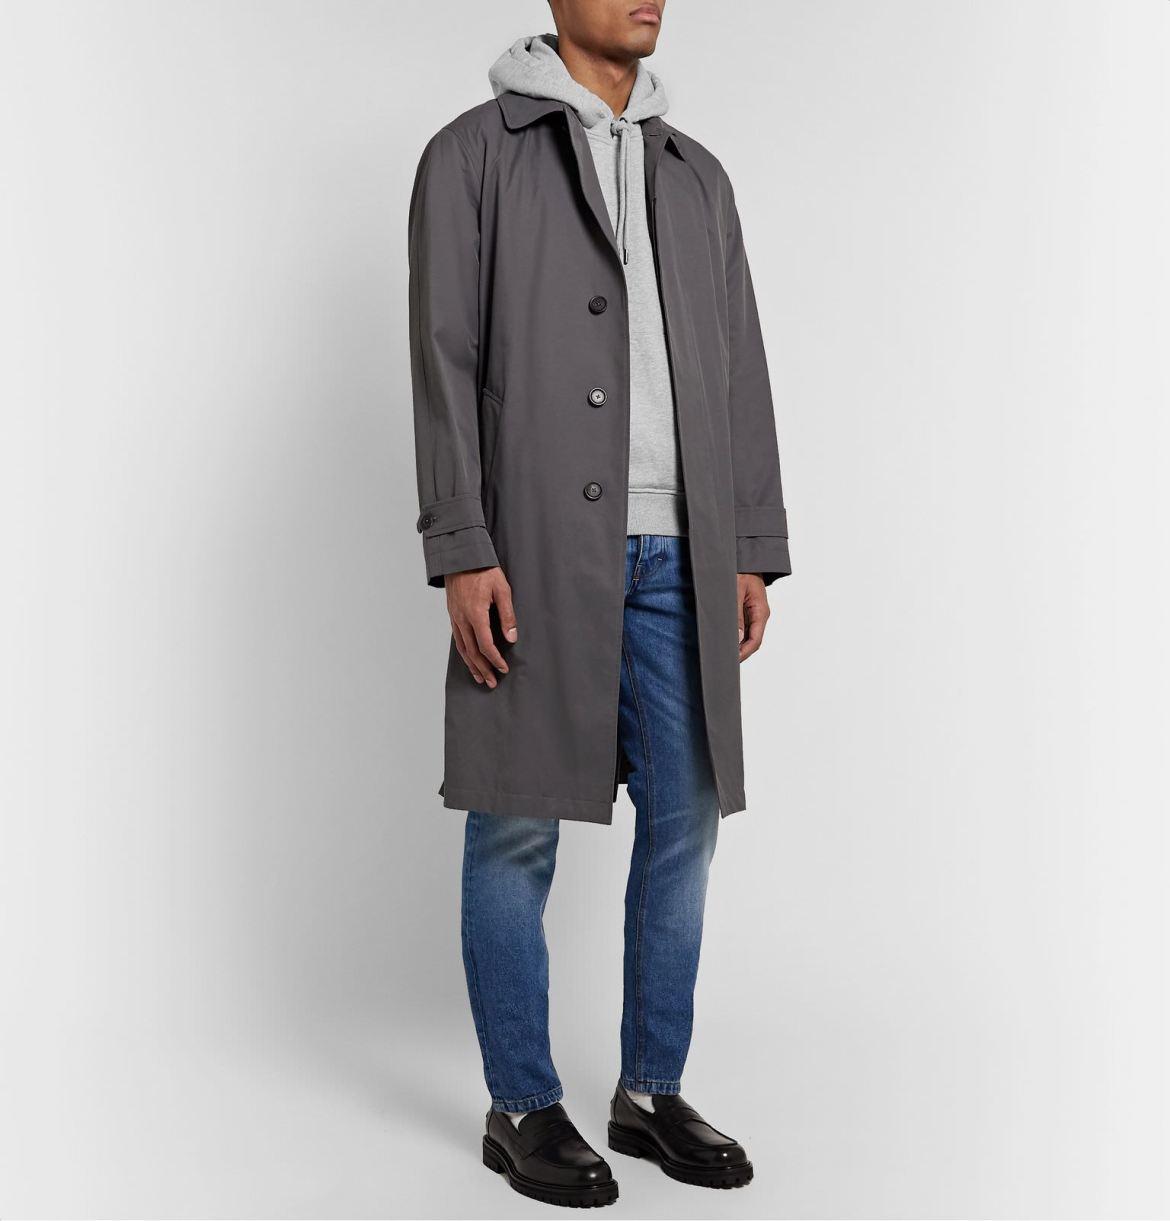 hoodie sur manteau homme